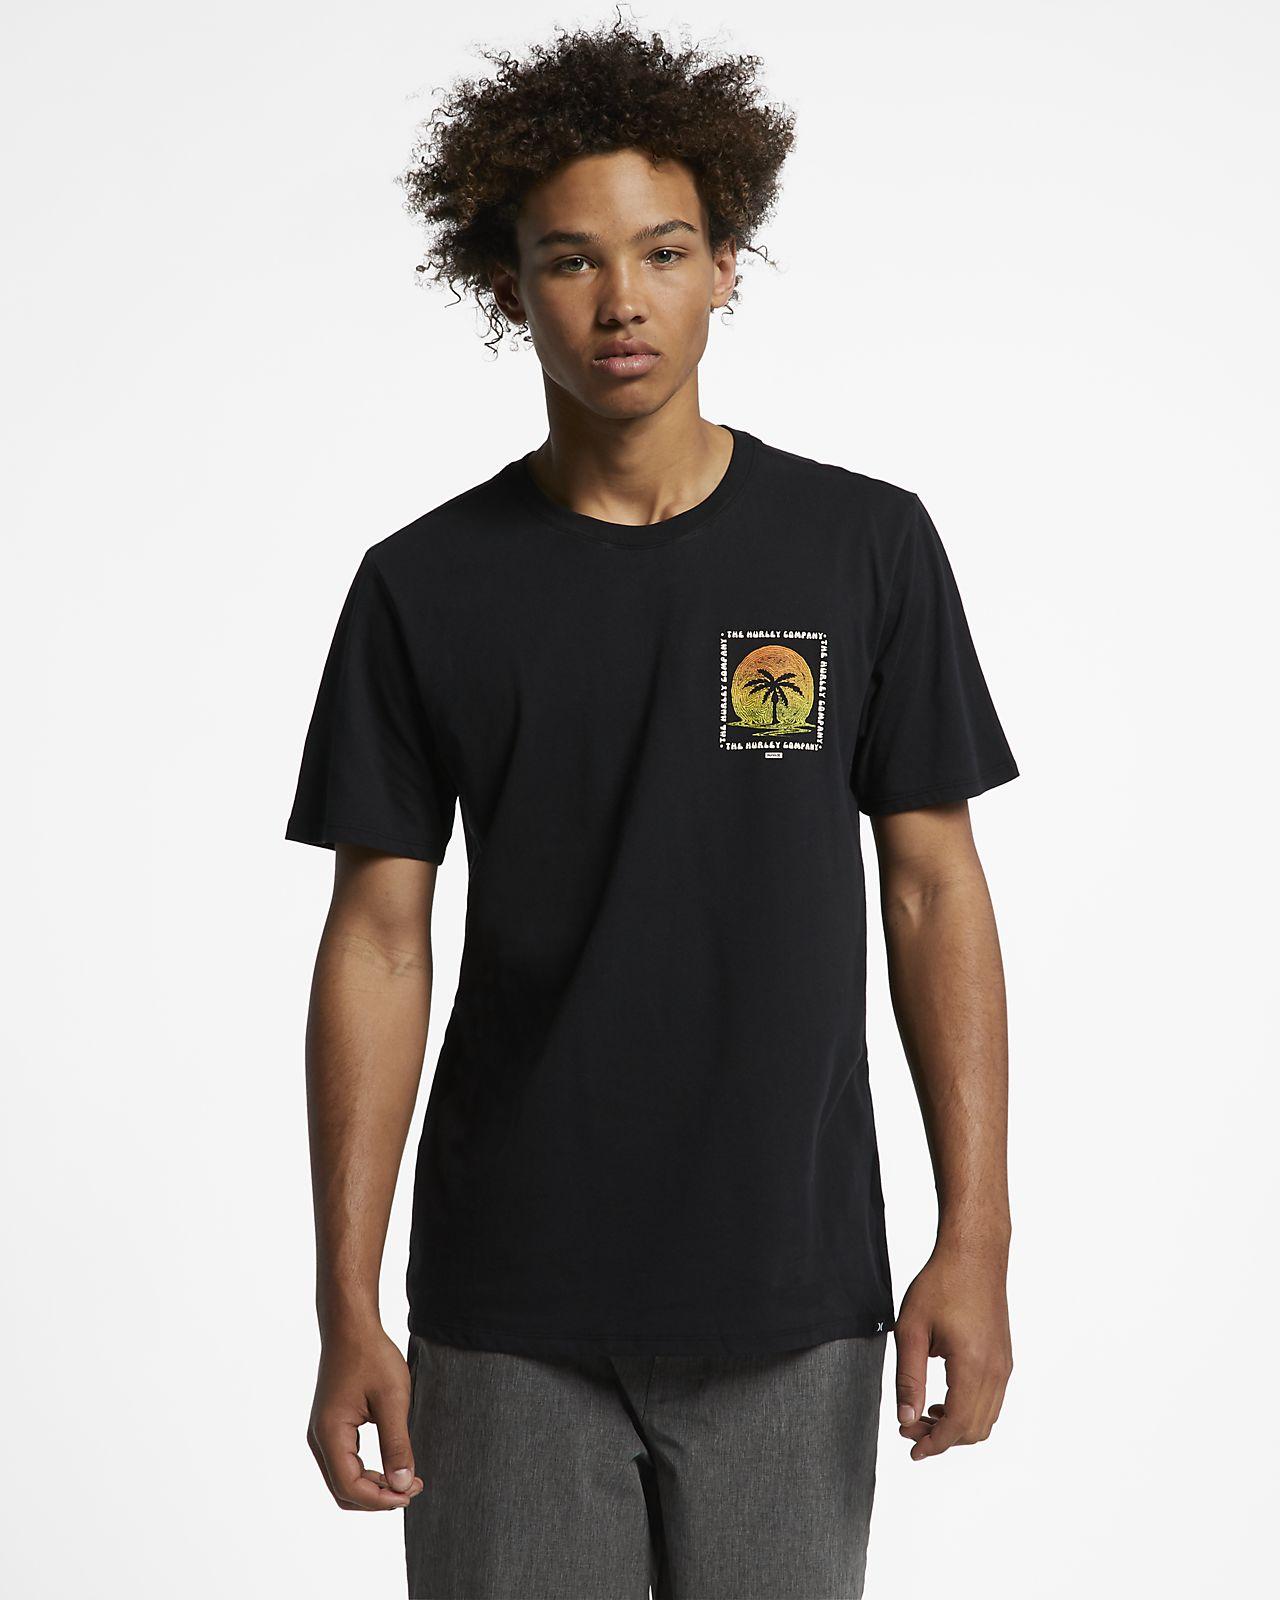 Hurley Dri-FIT Trippy Palms Men's T-Shirt